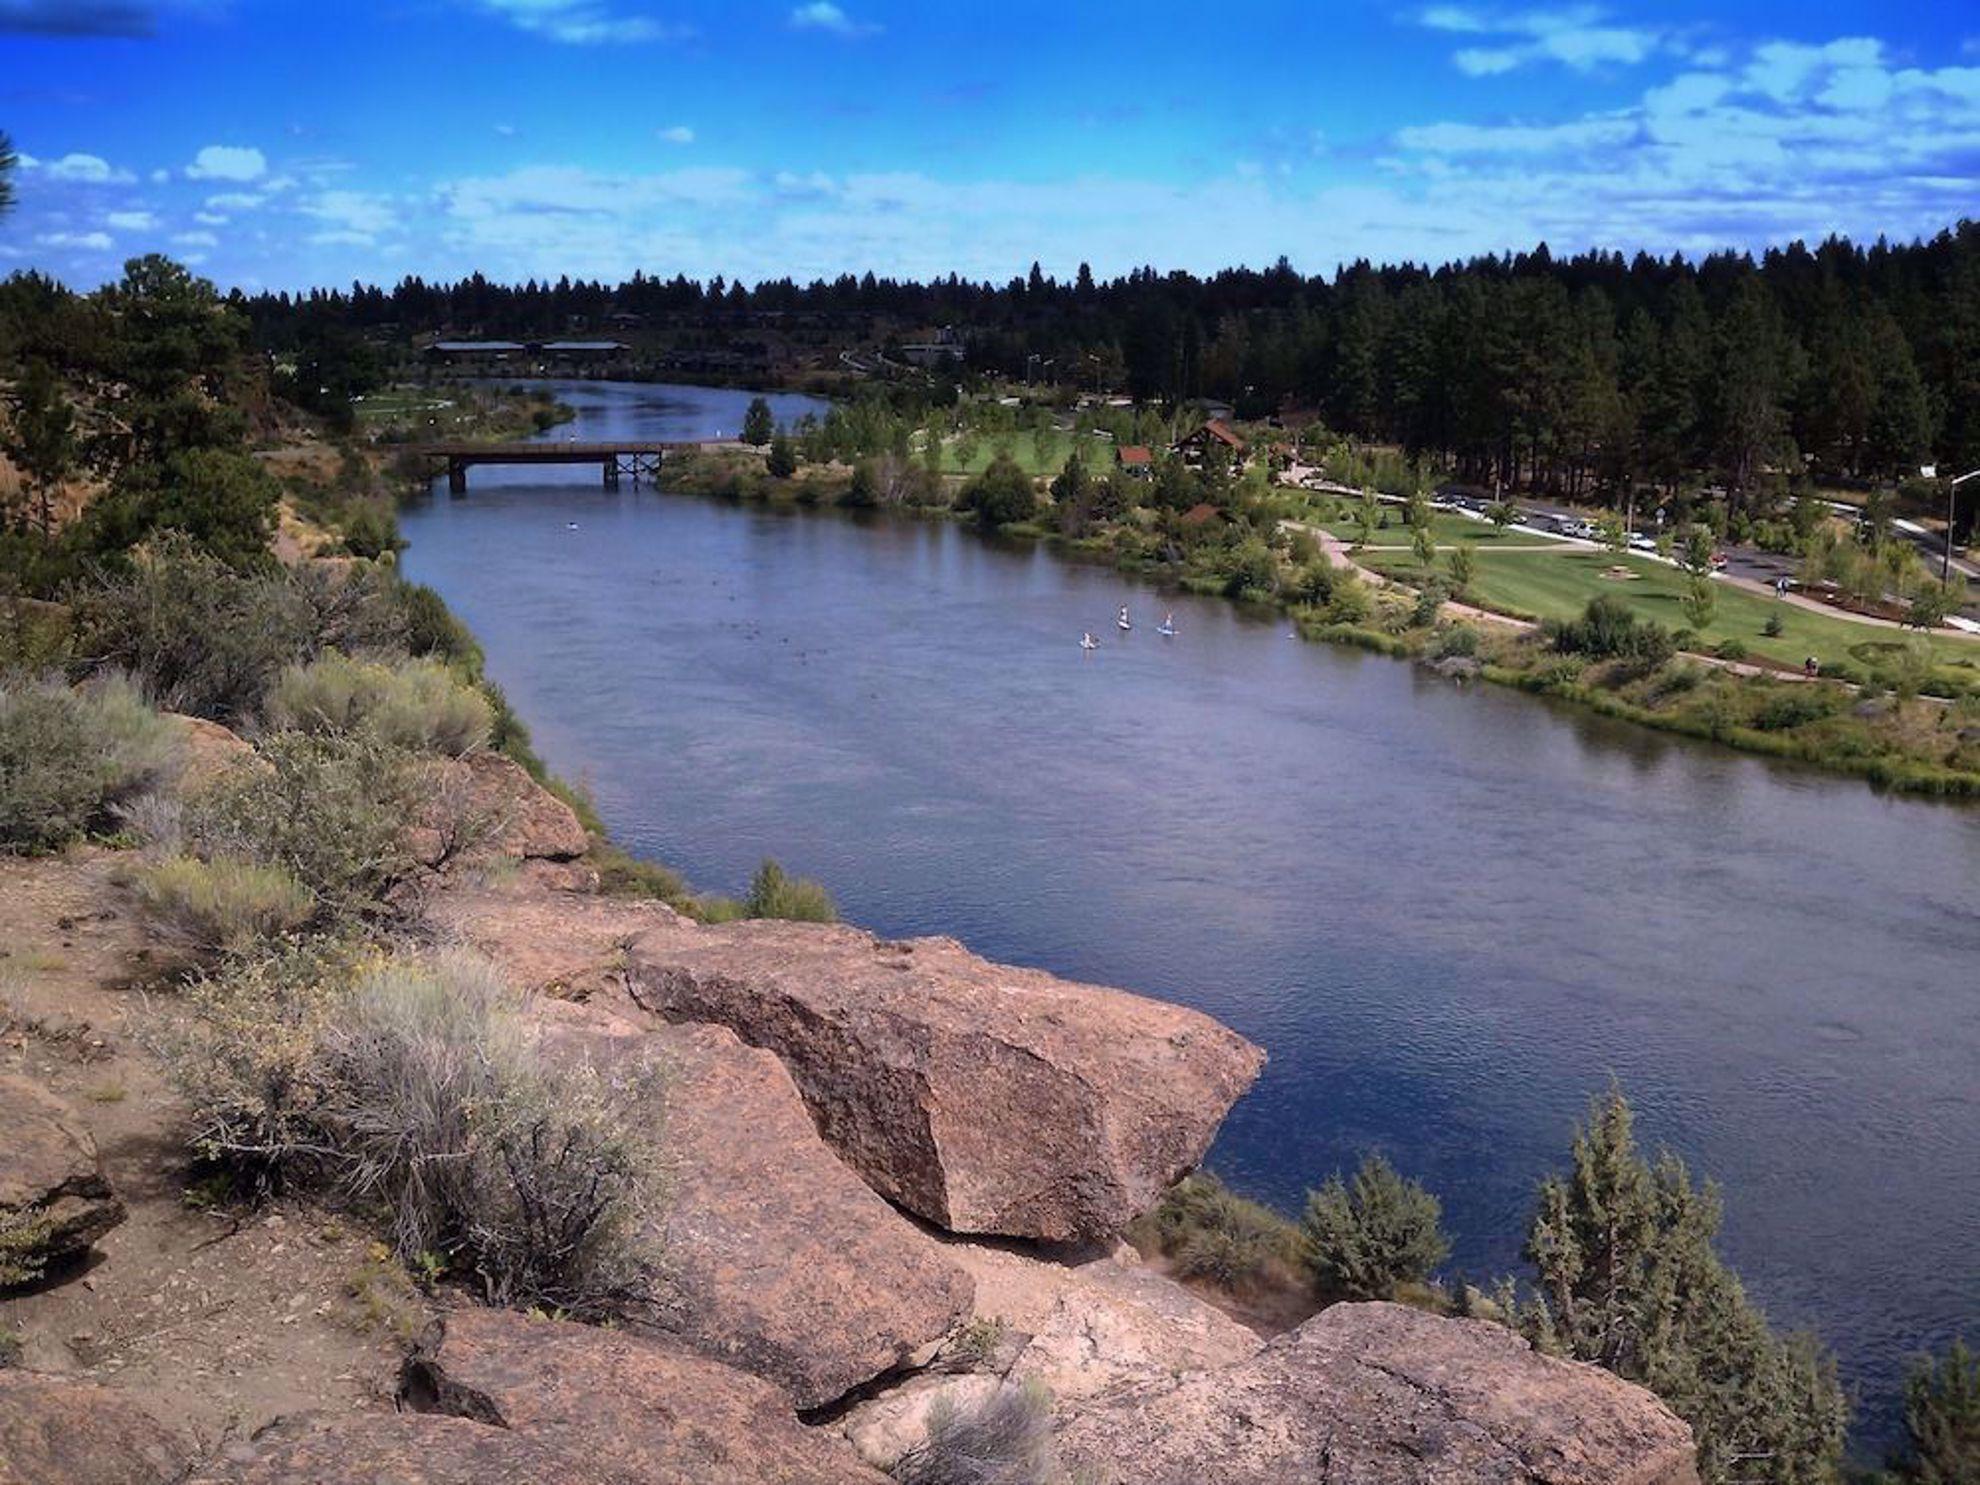 River in Bend, Oregon